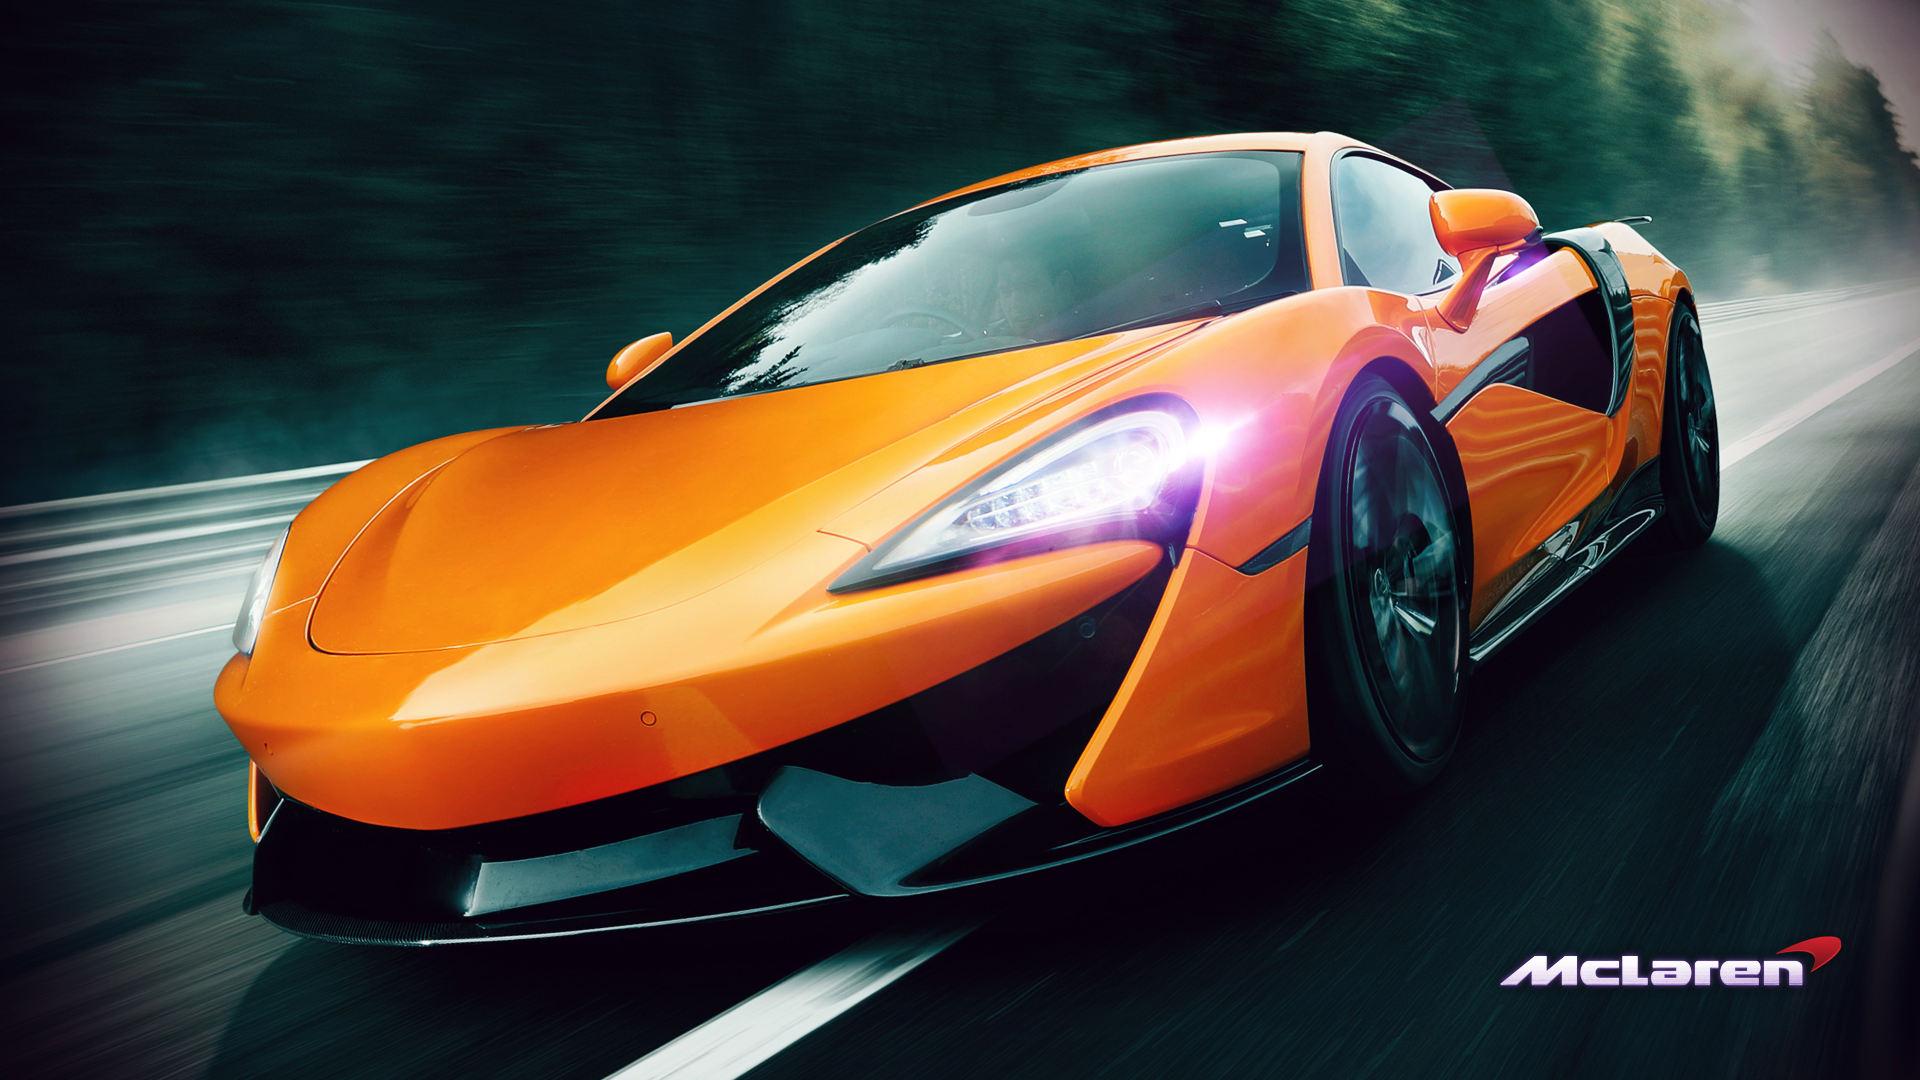 Sports Car Wallpaper McLaren Pictures